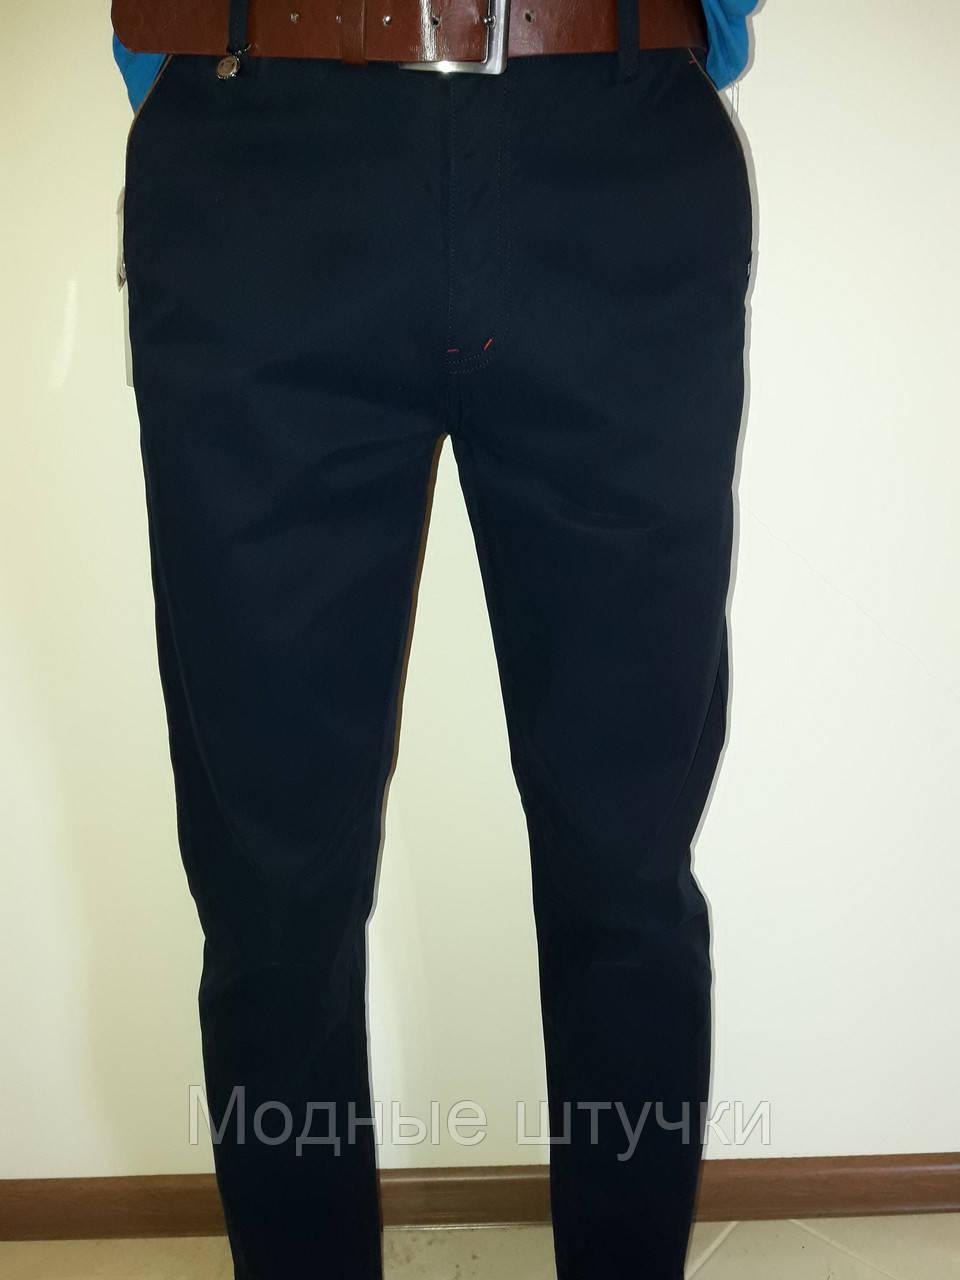 18b41233e4c Мужские брюки темно-синие Catenvin 2012-19 - Модные штучки в Николаеве